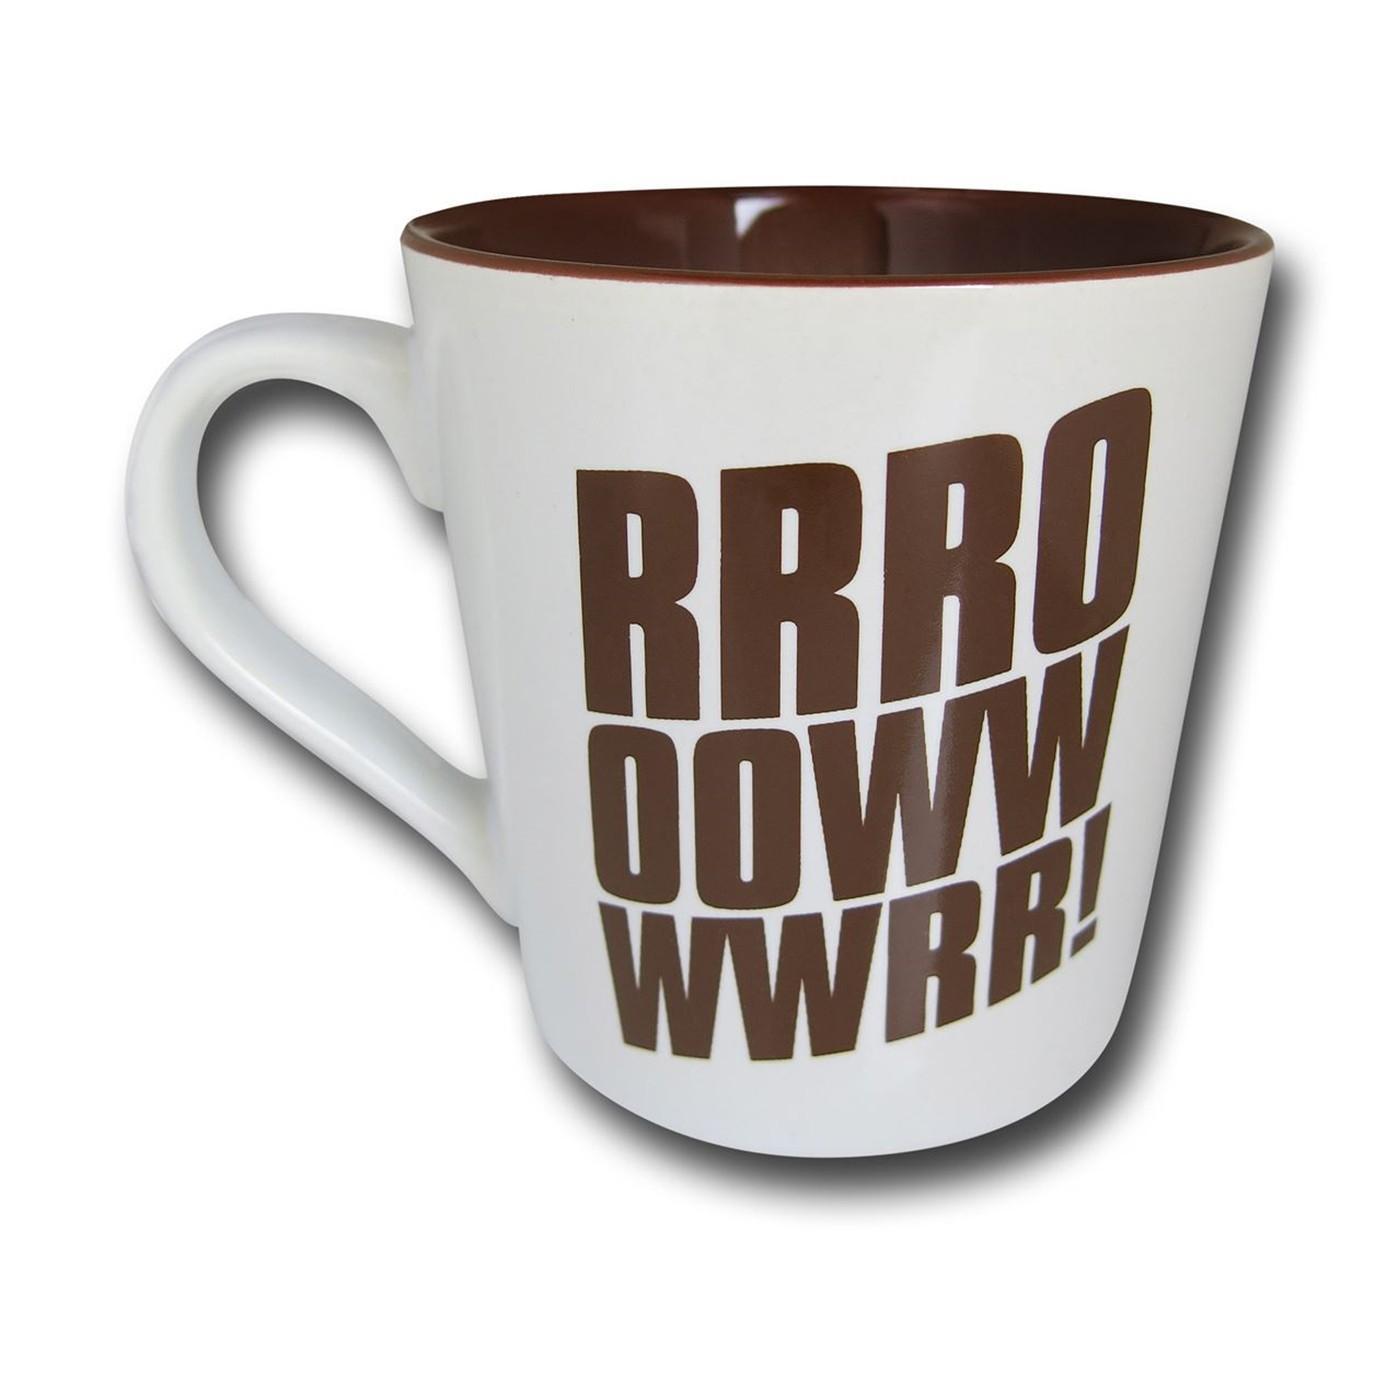 Star Wars Chewbacca Noise 12oz Mug